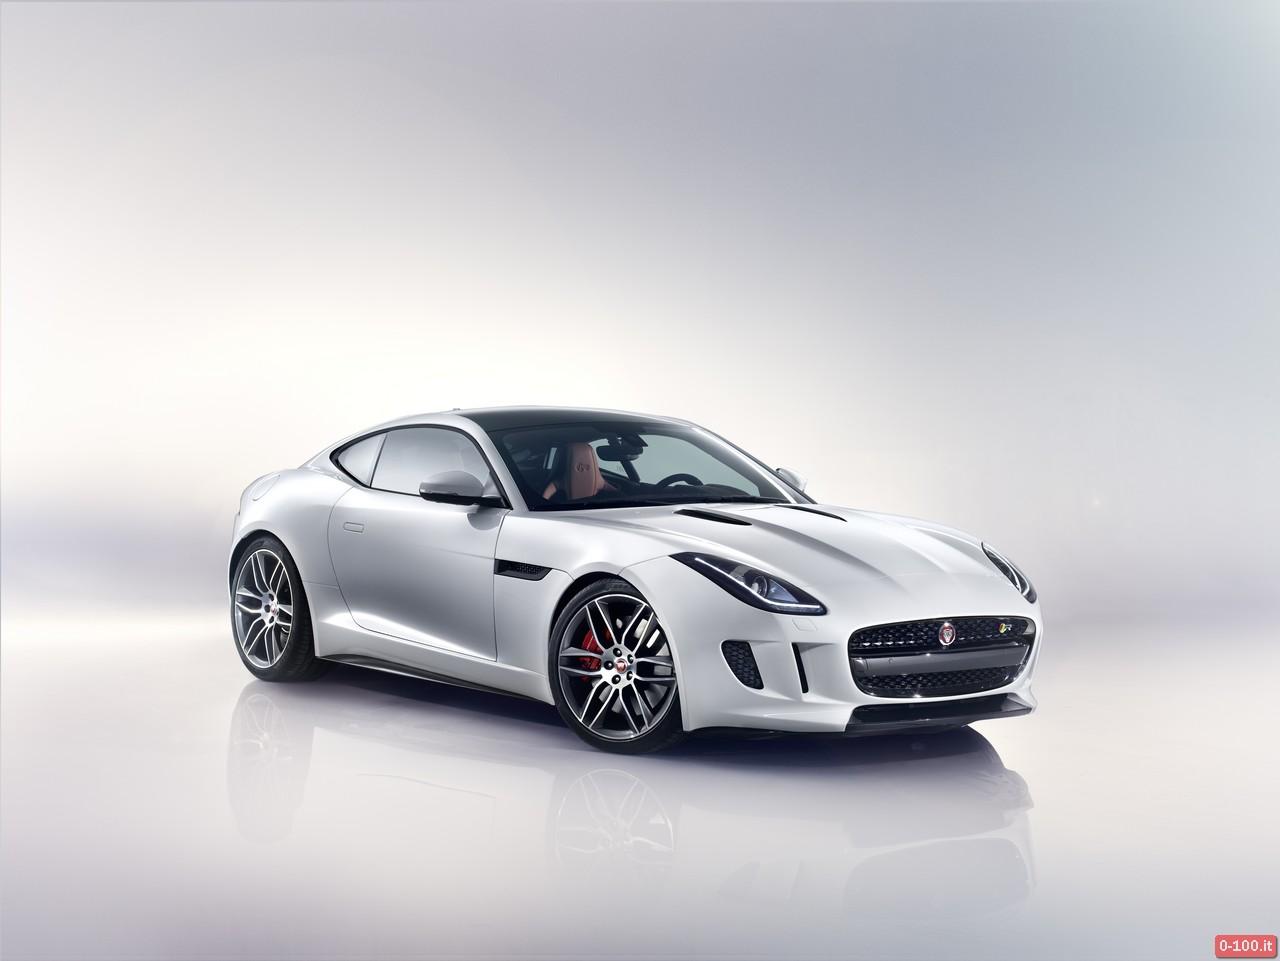 jaguar-f-type-r-coupe_price-prezzo-0-100_1